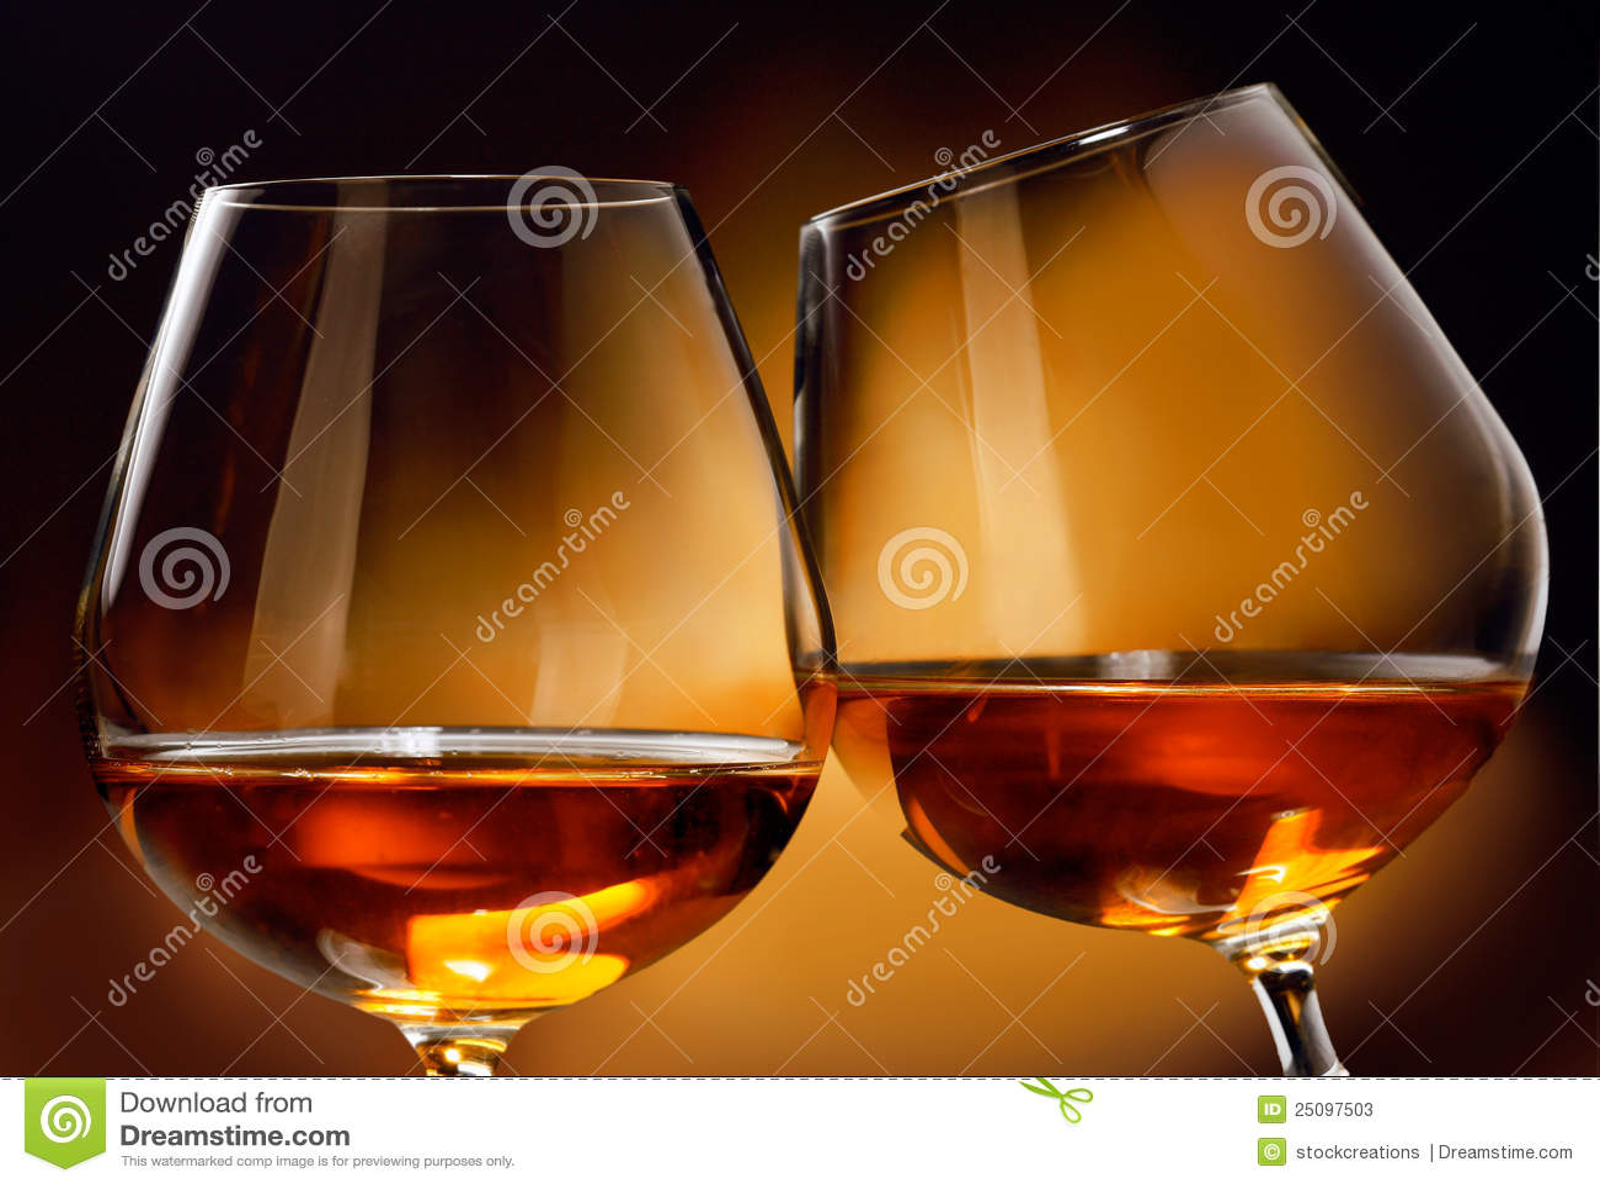 http://thumbs.dreamstime.com/z/cognac-brandy-25097503.jpg